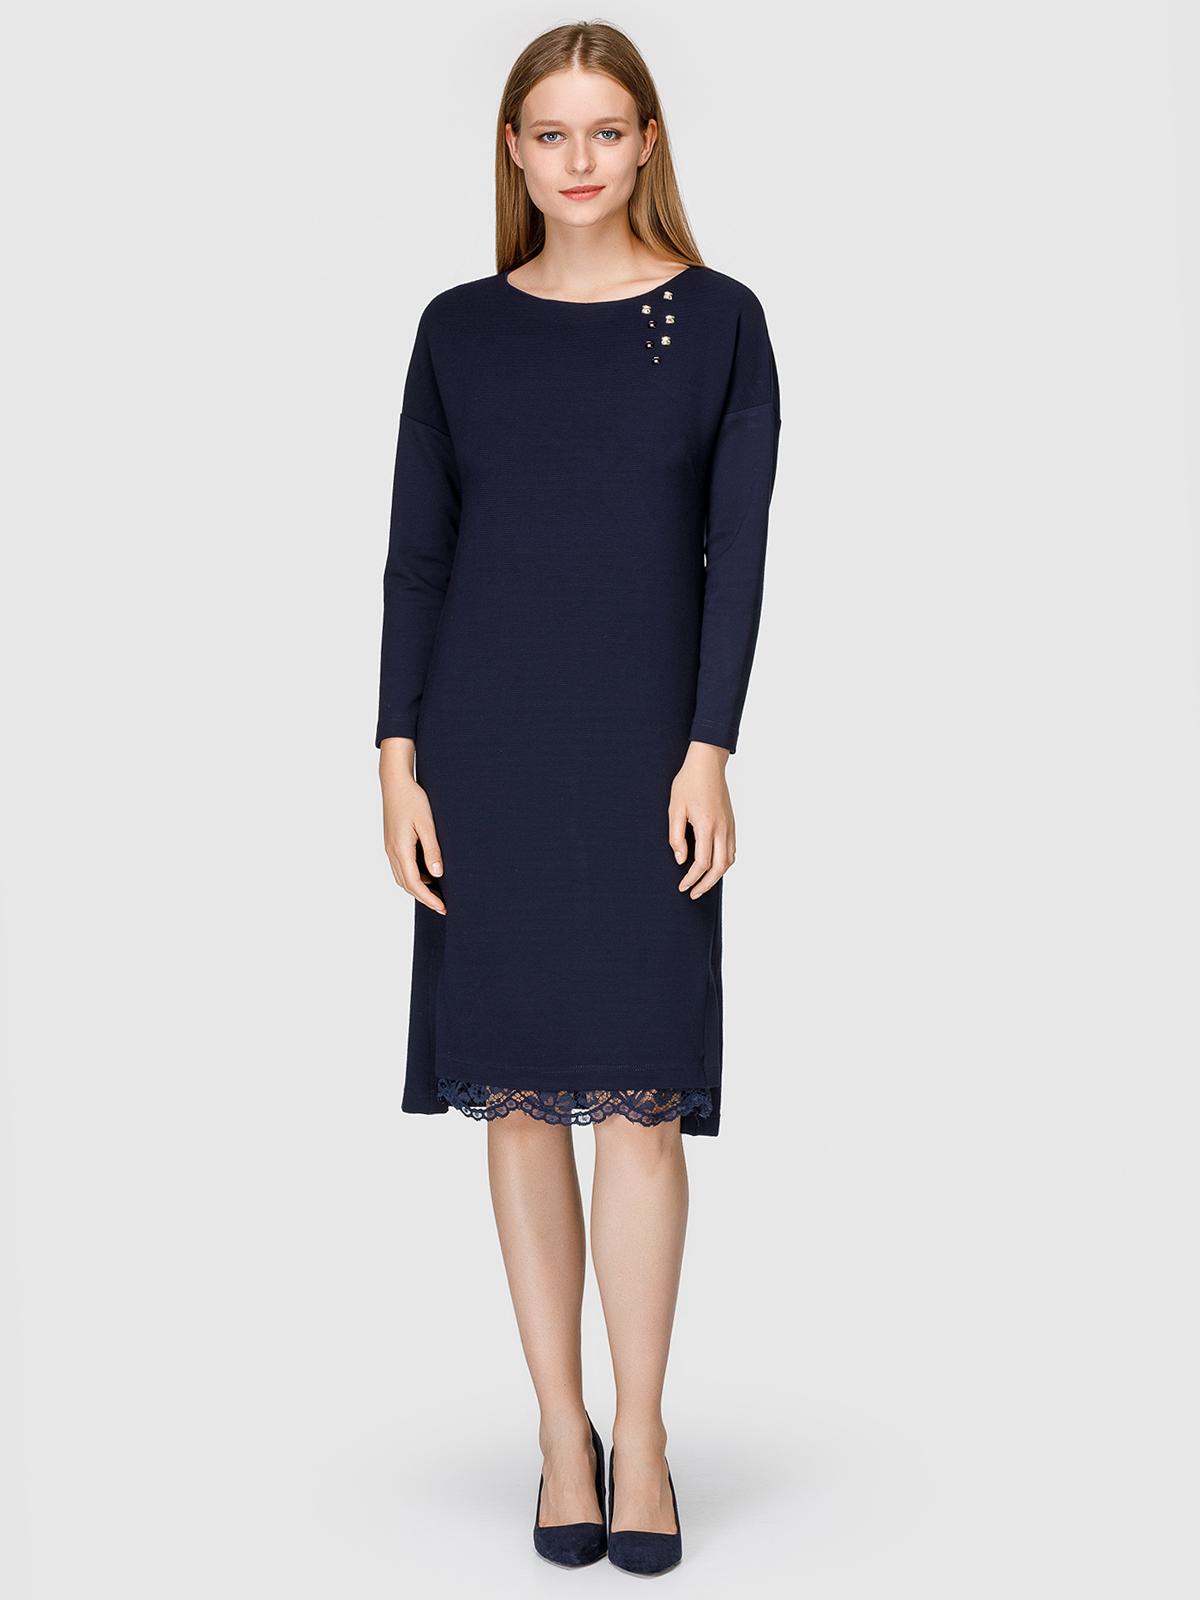 Платье женское Helmidge 7501 синее 18 UK фото